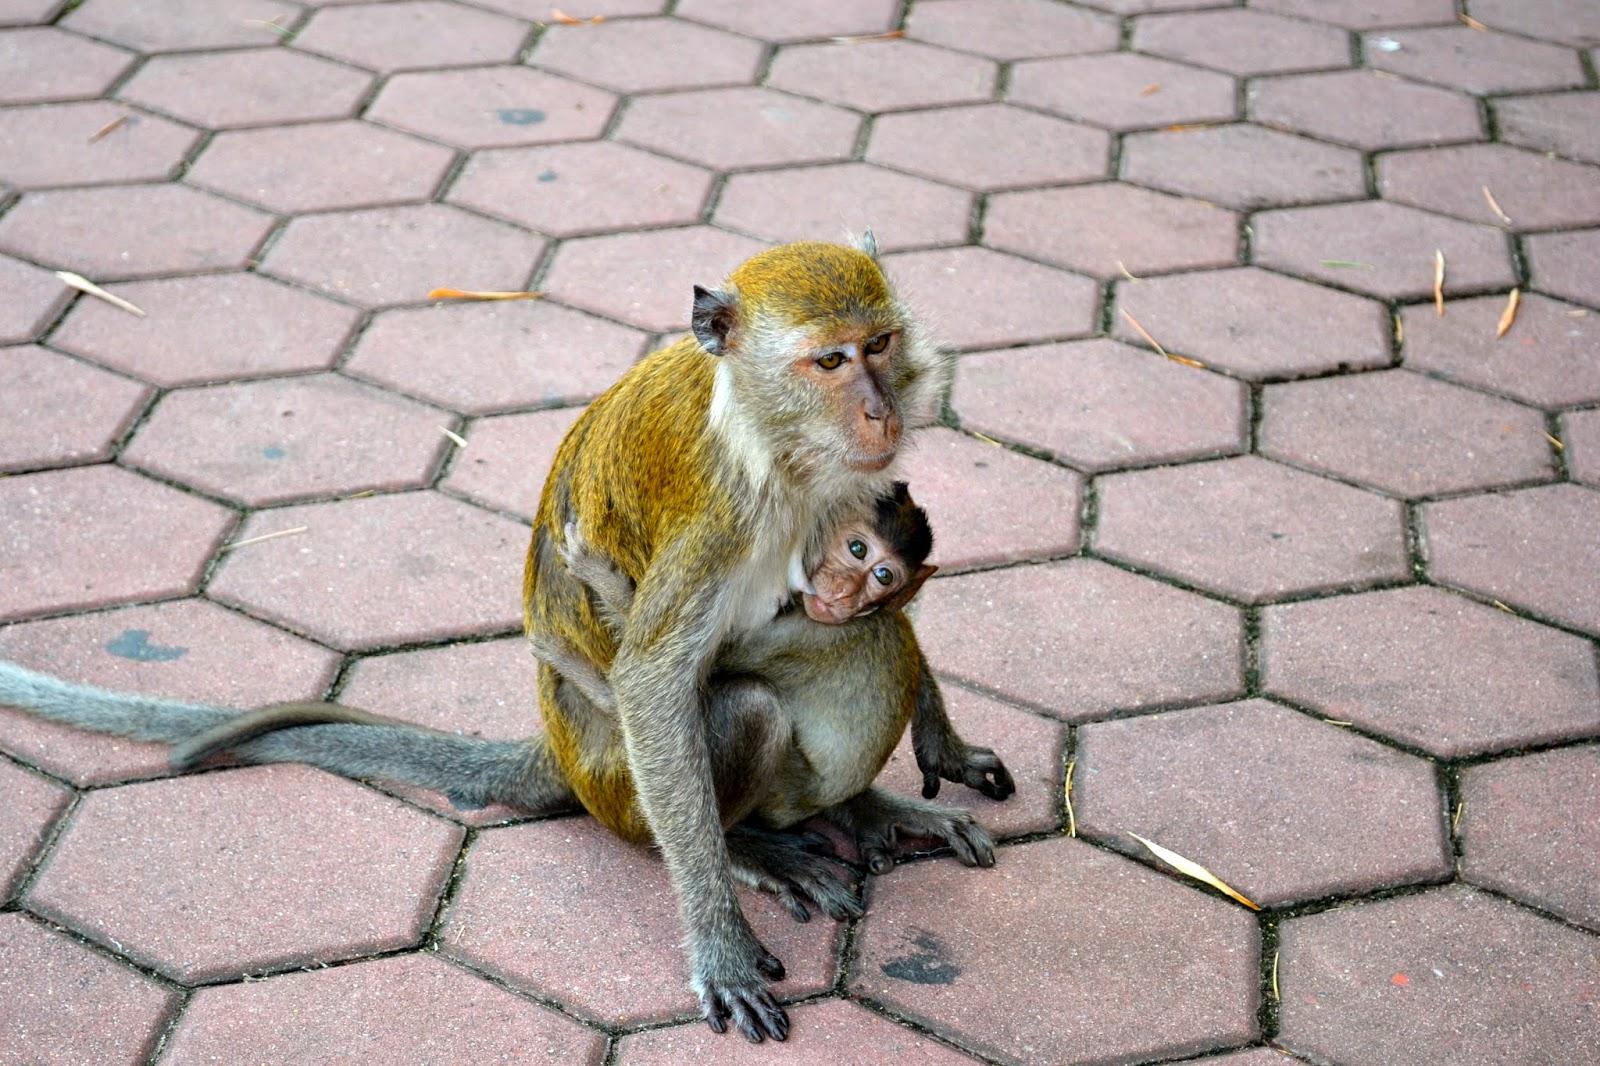 Monos en Batu Caves, Kuala Lumpur, Malasia